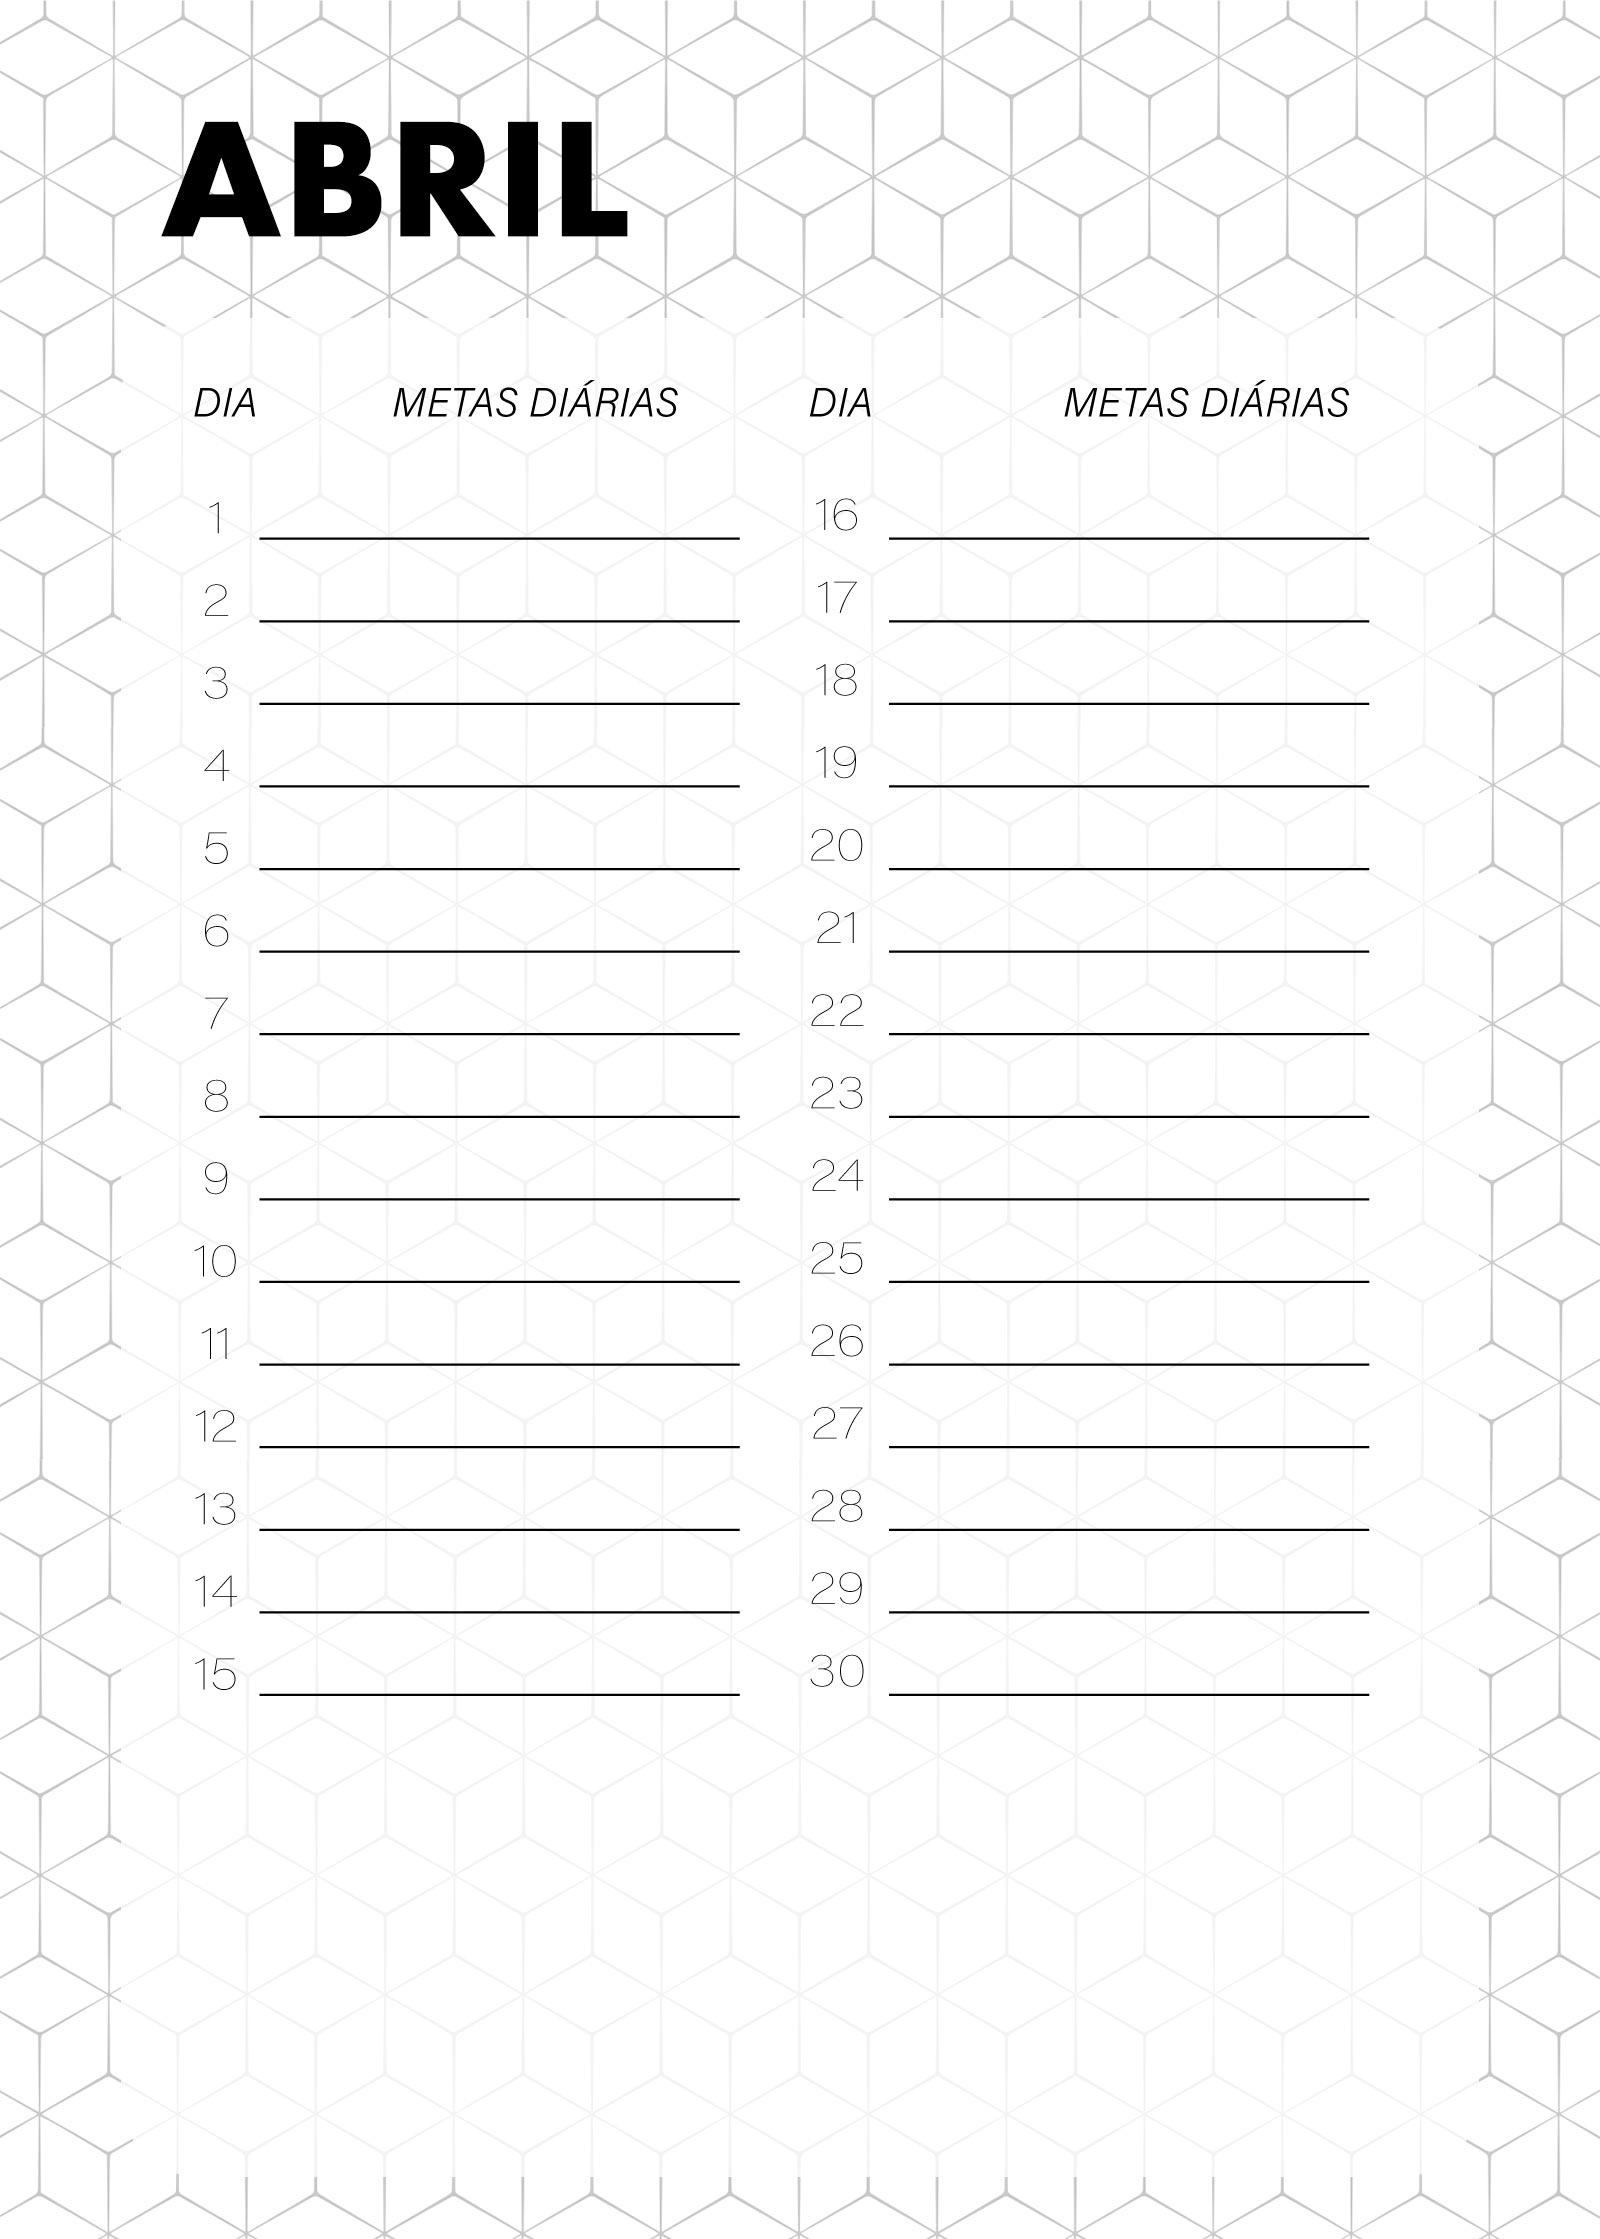 Planner Preto e Branco Metas Diarias Abril